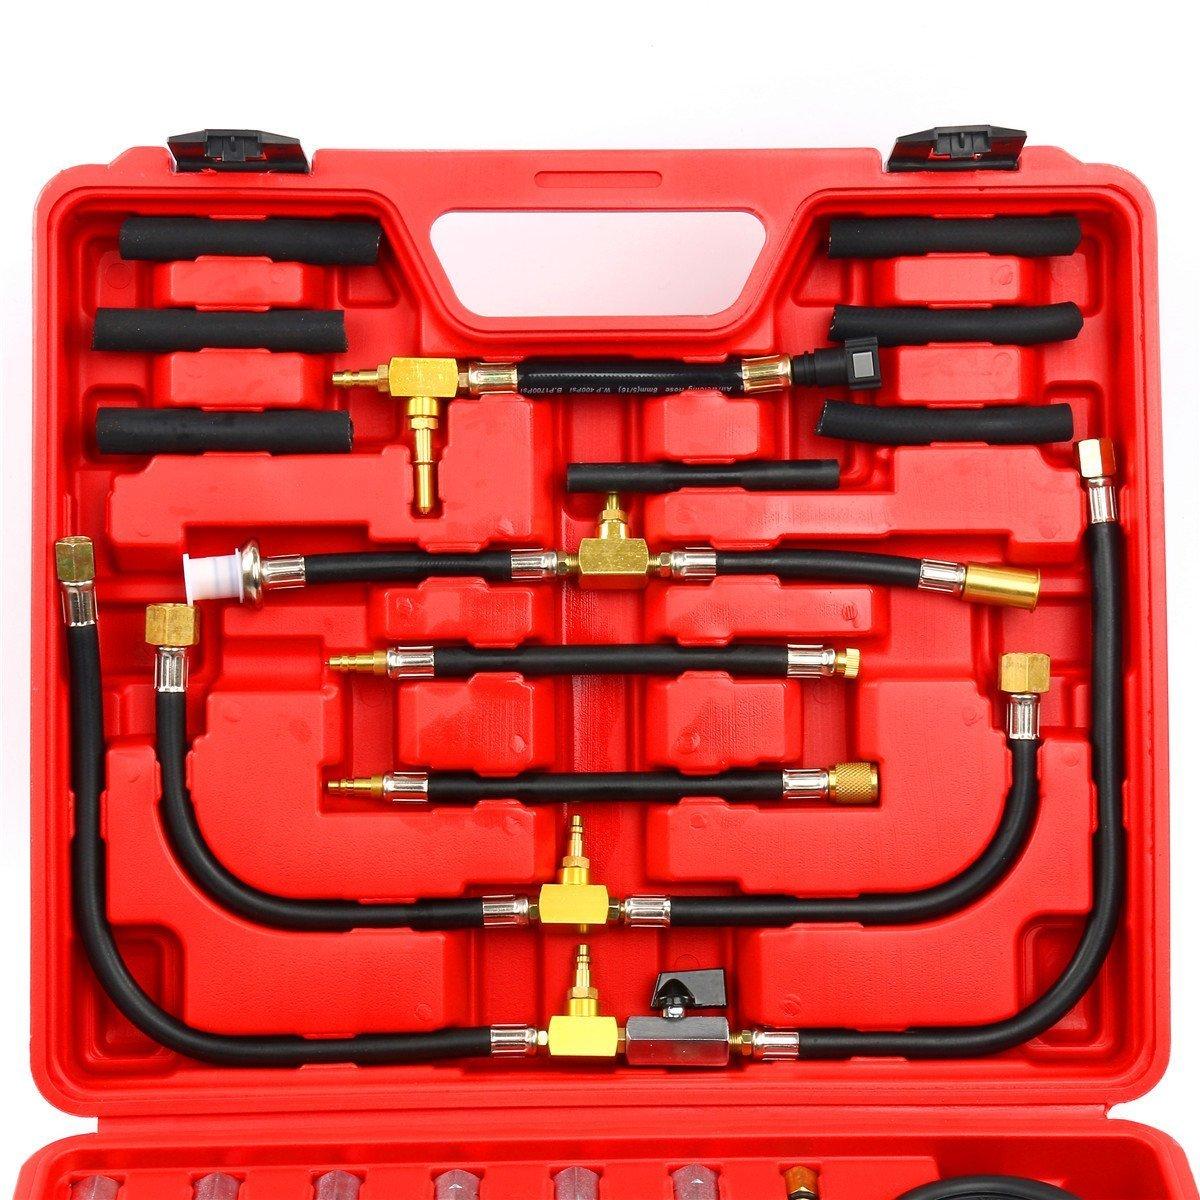 8MILELAKE Pro Oil Fuel Injection Pressure Tester Kit 0-140 PSI System by 8MILELAKE (Image #7)